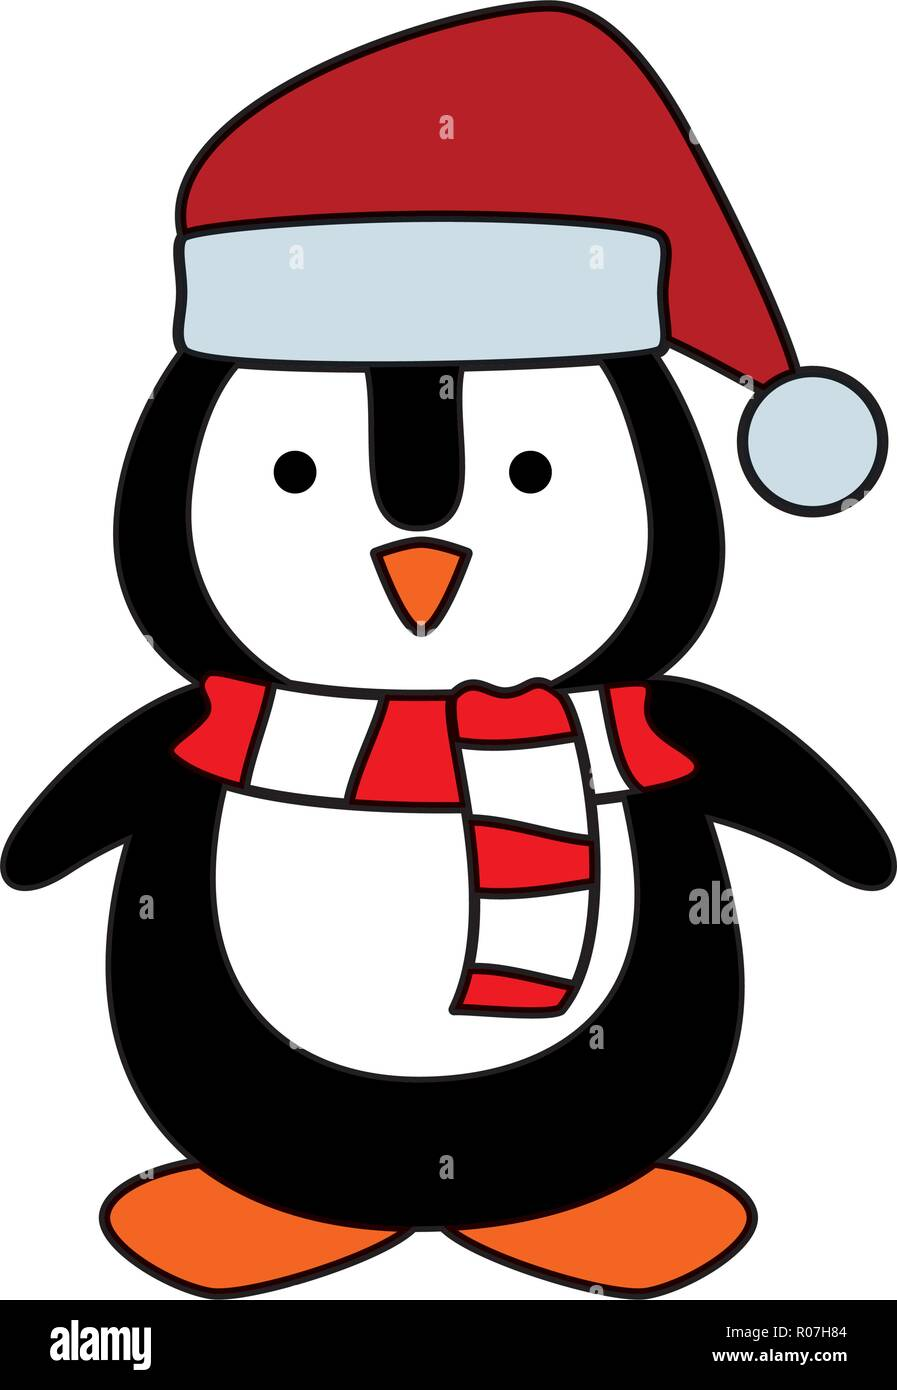 3311f682d2c4a cute penguin with santa claus hat vector illustration design - Stock Vector